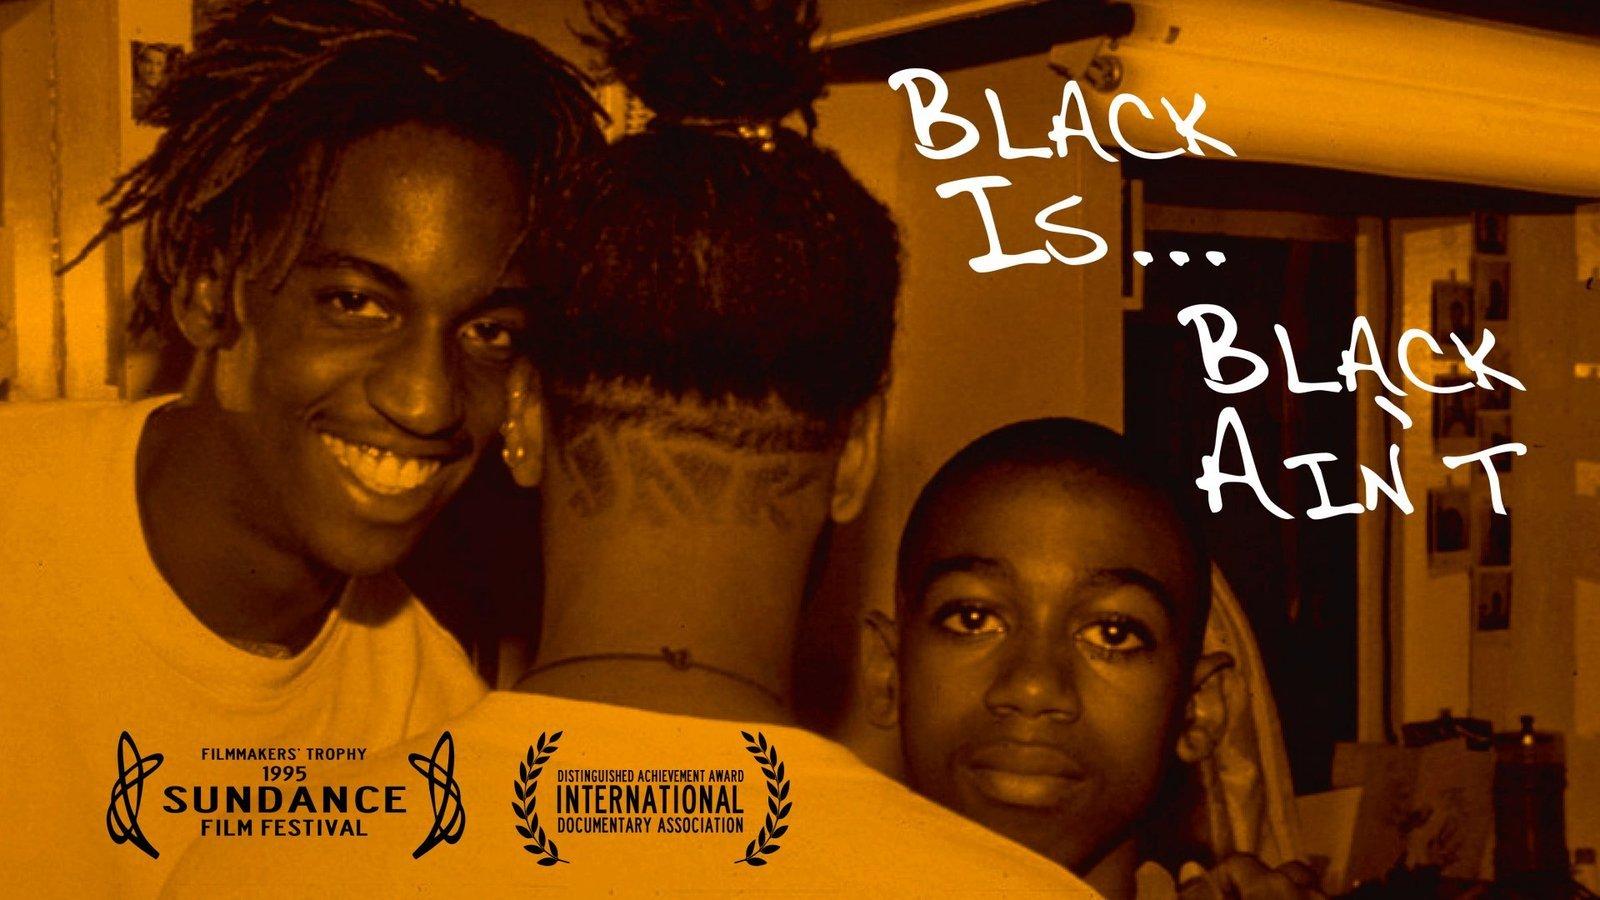 black is black aint movie poster